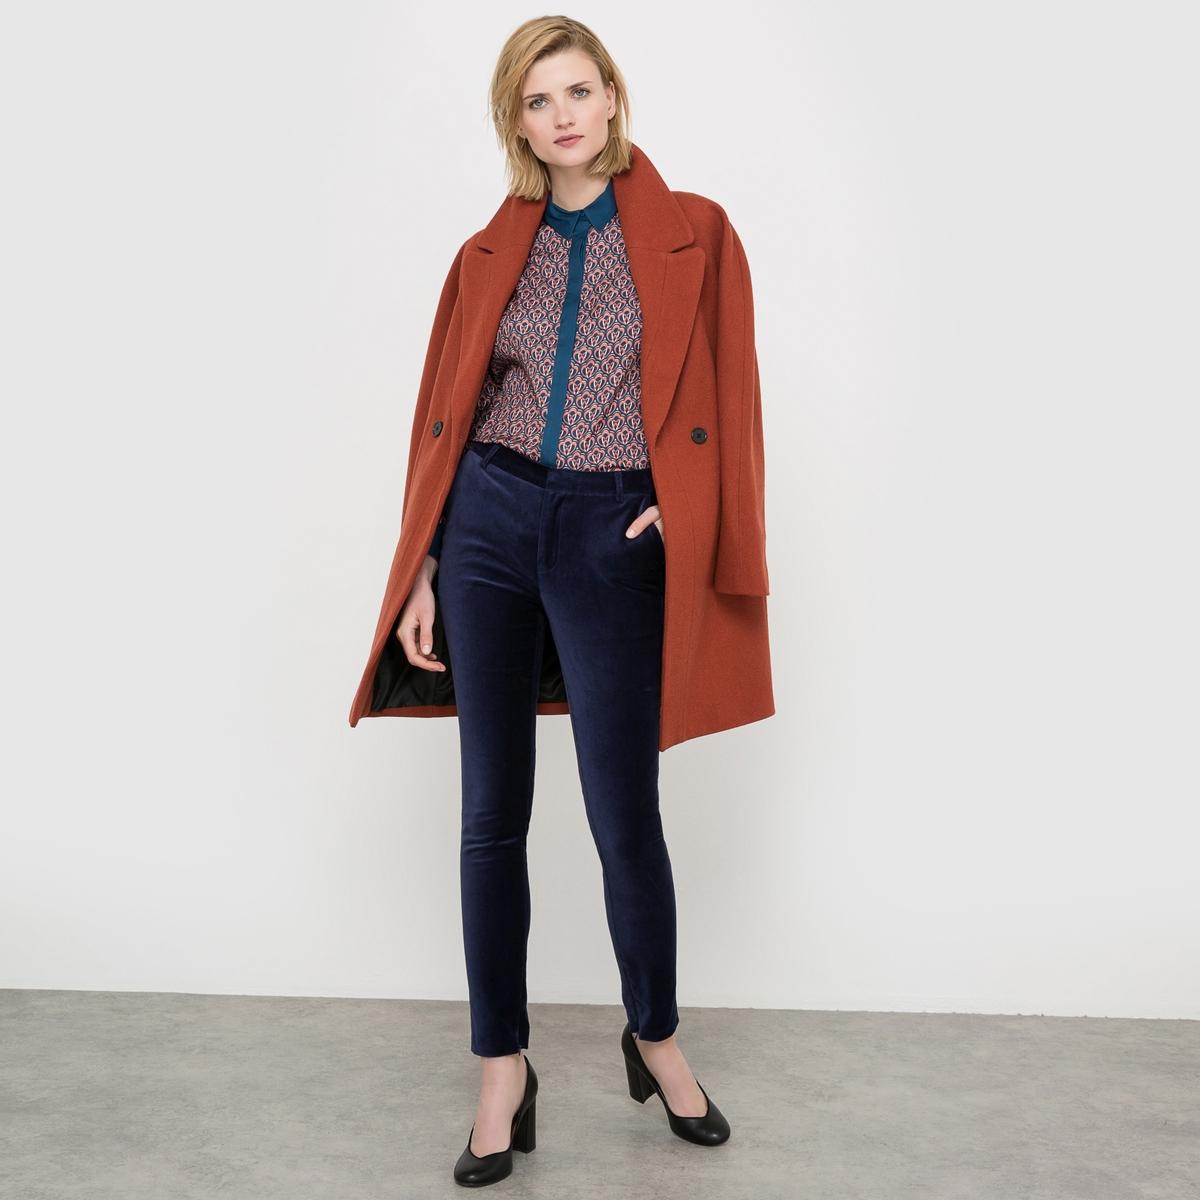 Бушлат 50% шерсти пальто из шерстяного драпа 70